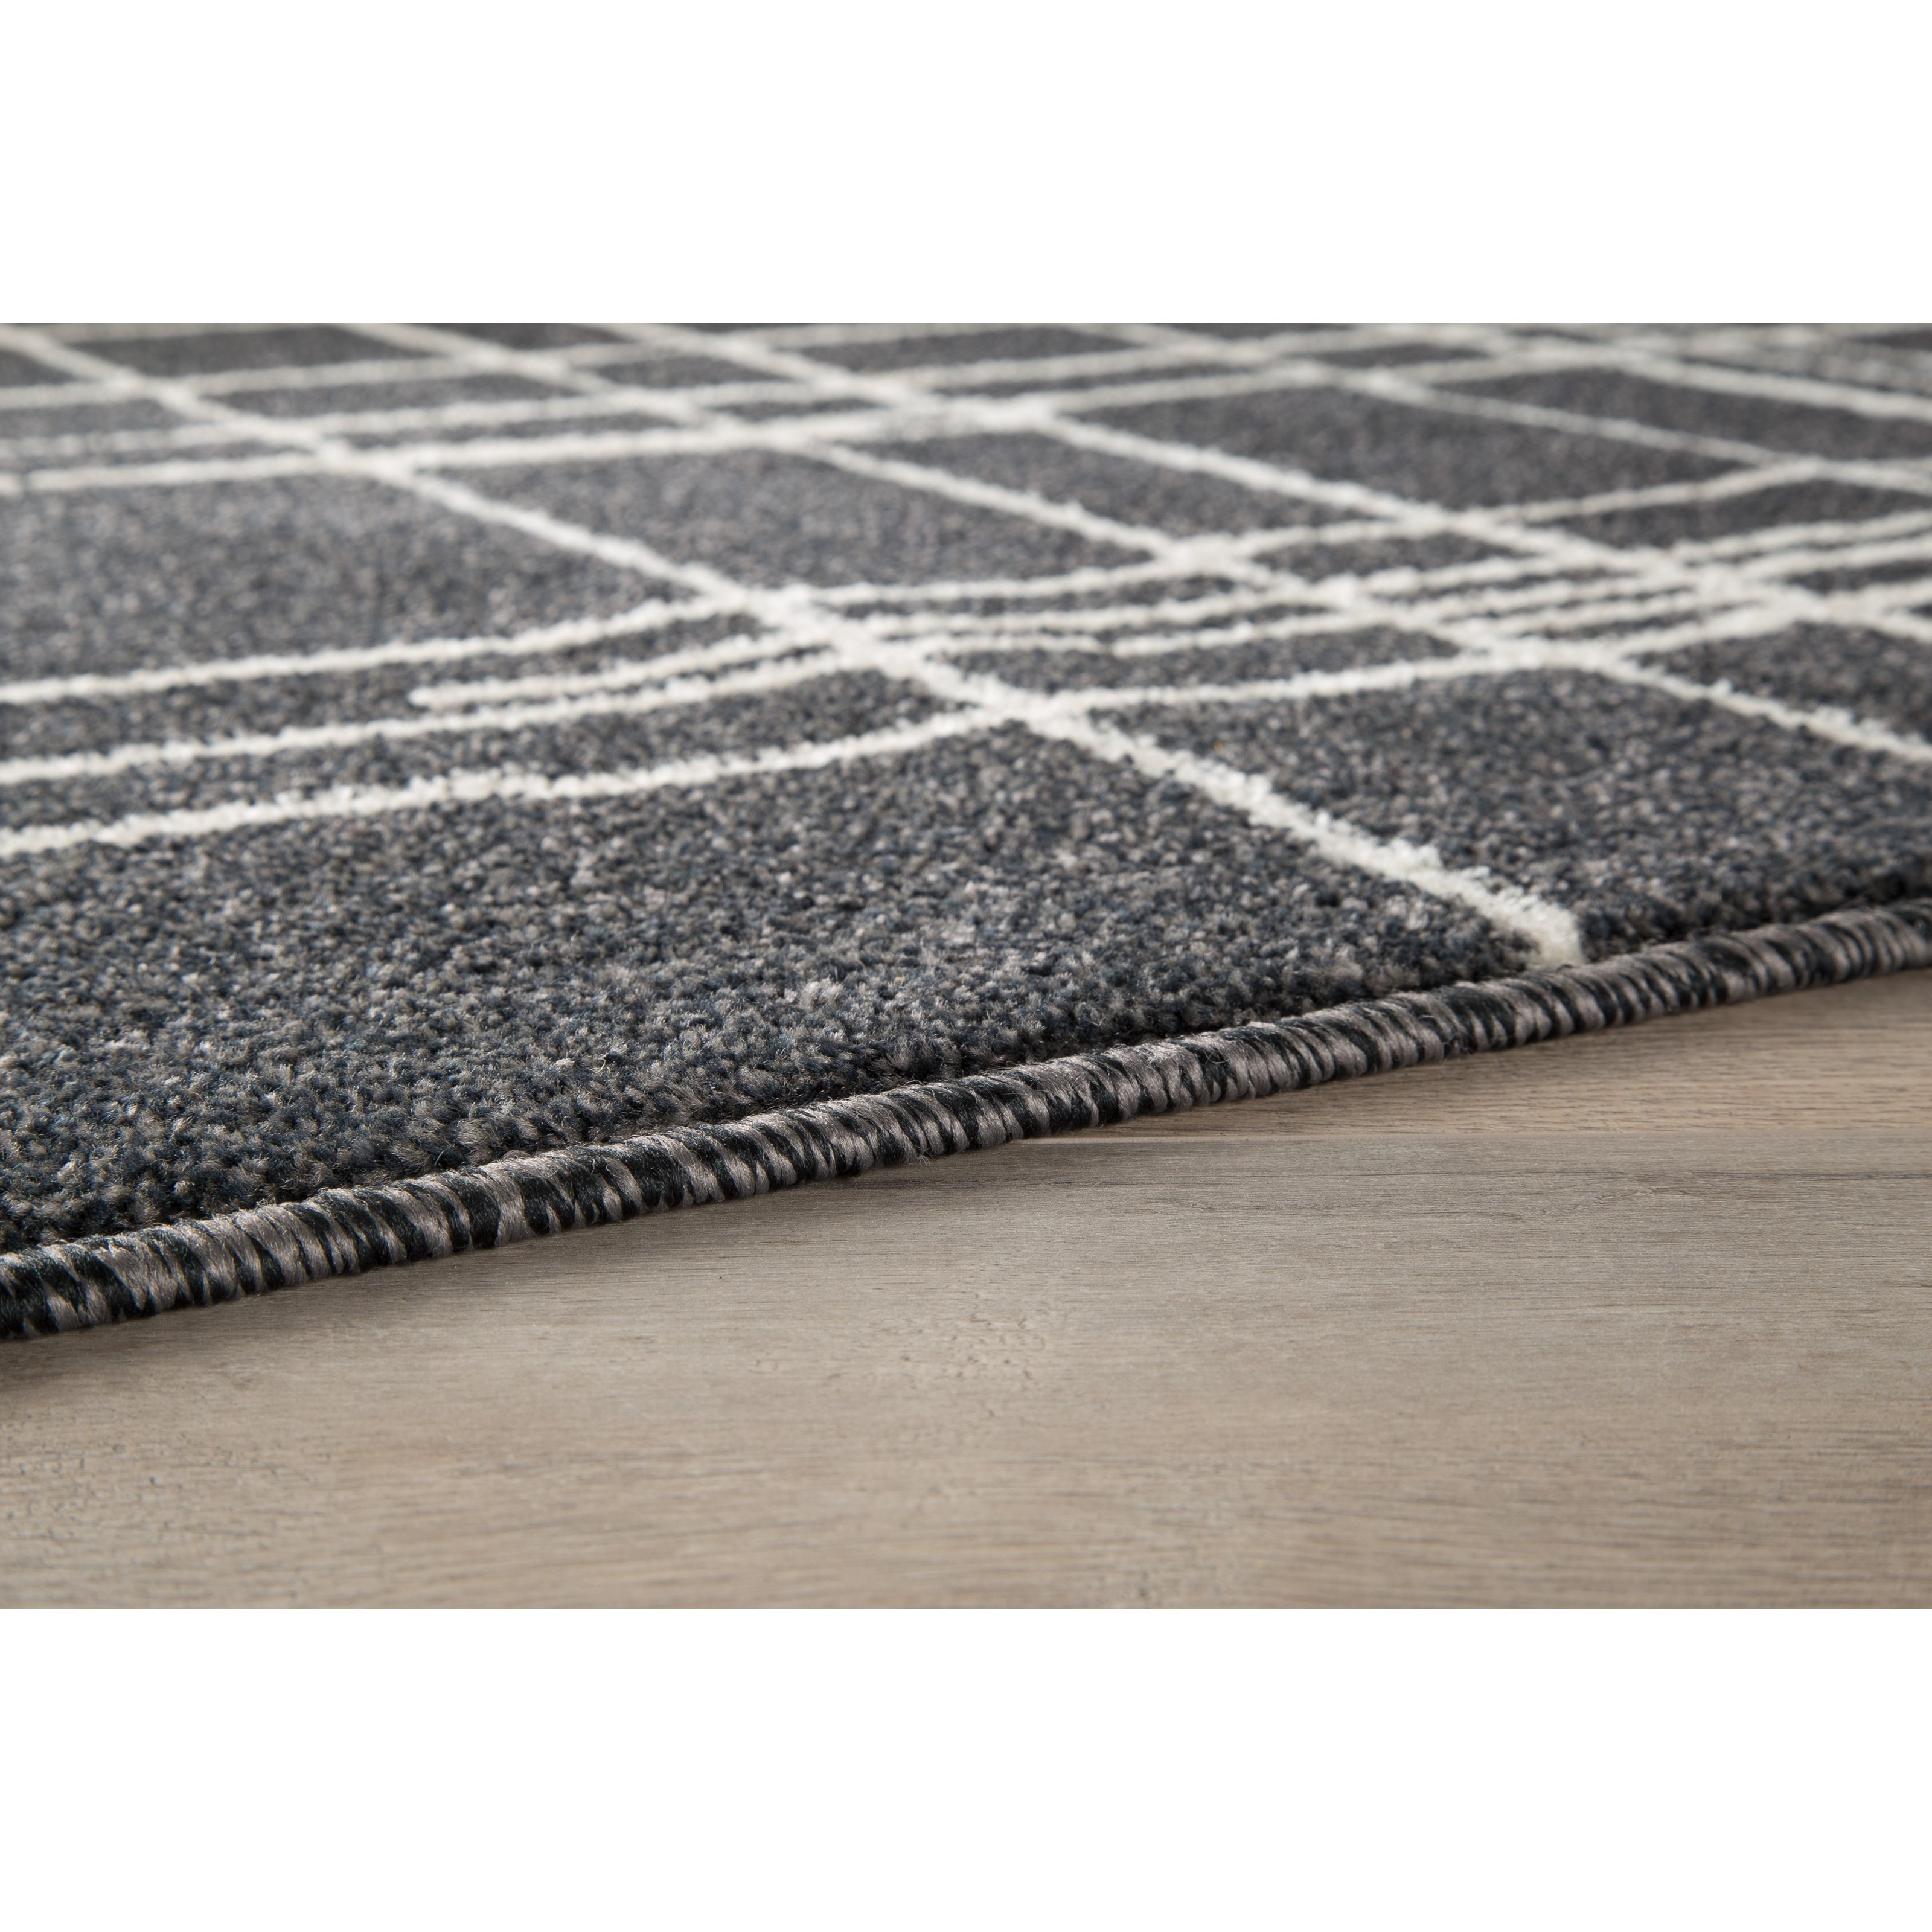 benchcraft contemporary area rugs jai black white medium rug virginia furniture market rugs. Black Bedroom Furniture Sets. Home Design Ideas